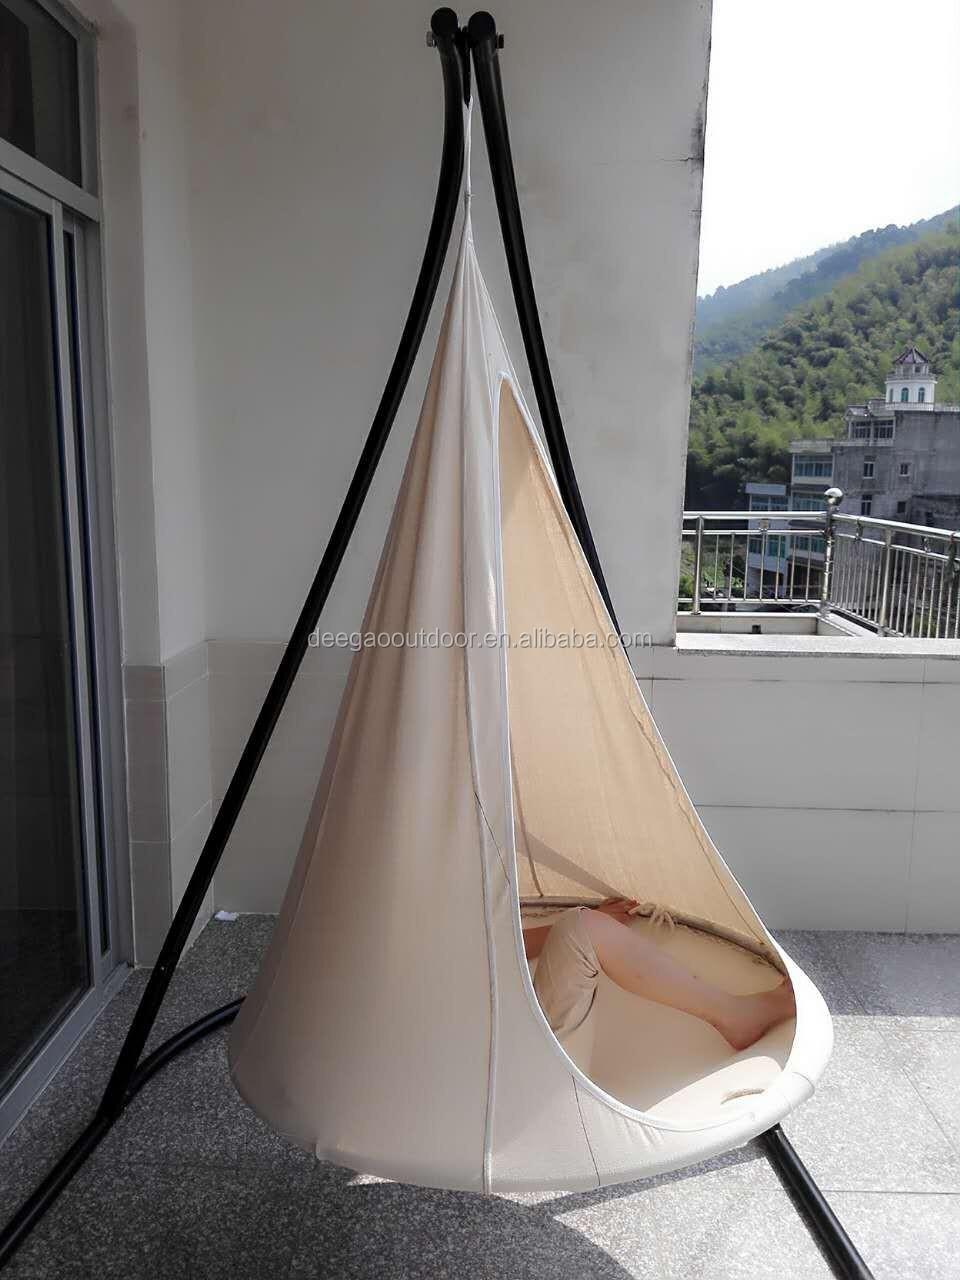 Hanging bed nest - Swing Hanging Chair Bed Adult Nest Outdoor Garden Swing